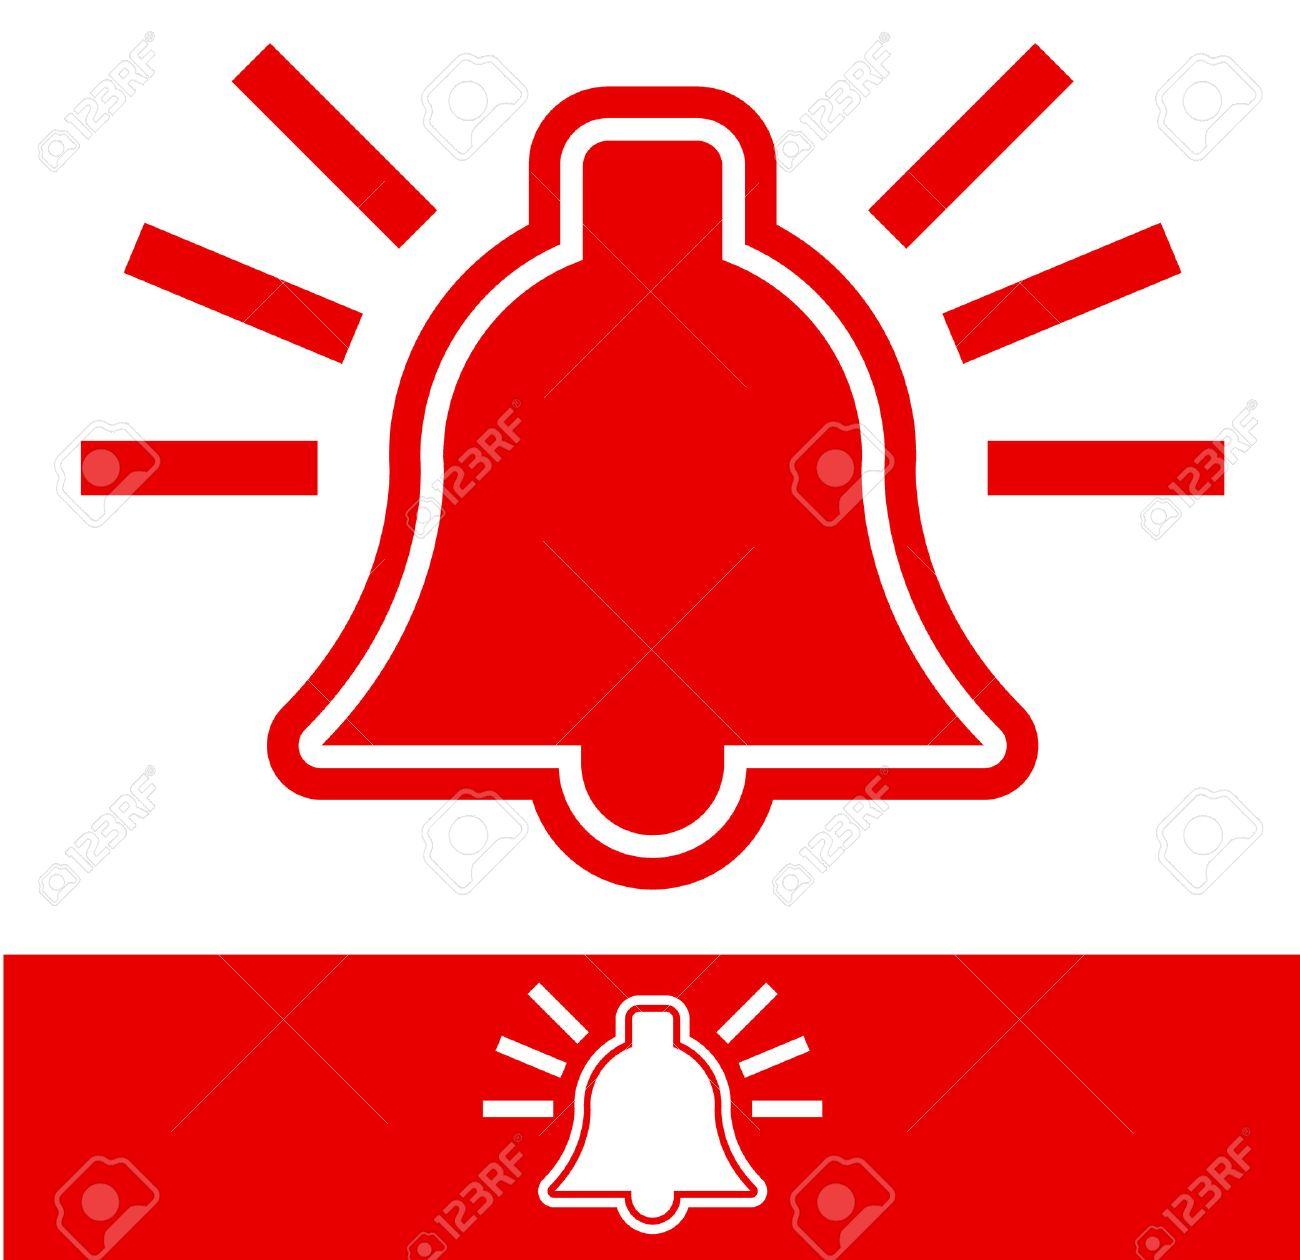 Alarm clipart red svg freeuse stock Free Alarm Clipart alarm bell, Download Free Clip Art on Owips.com svg freeuse stock